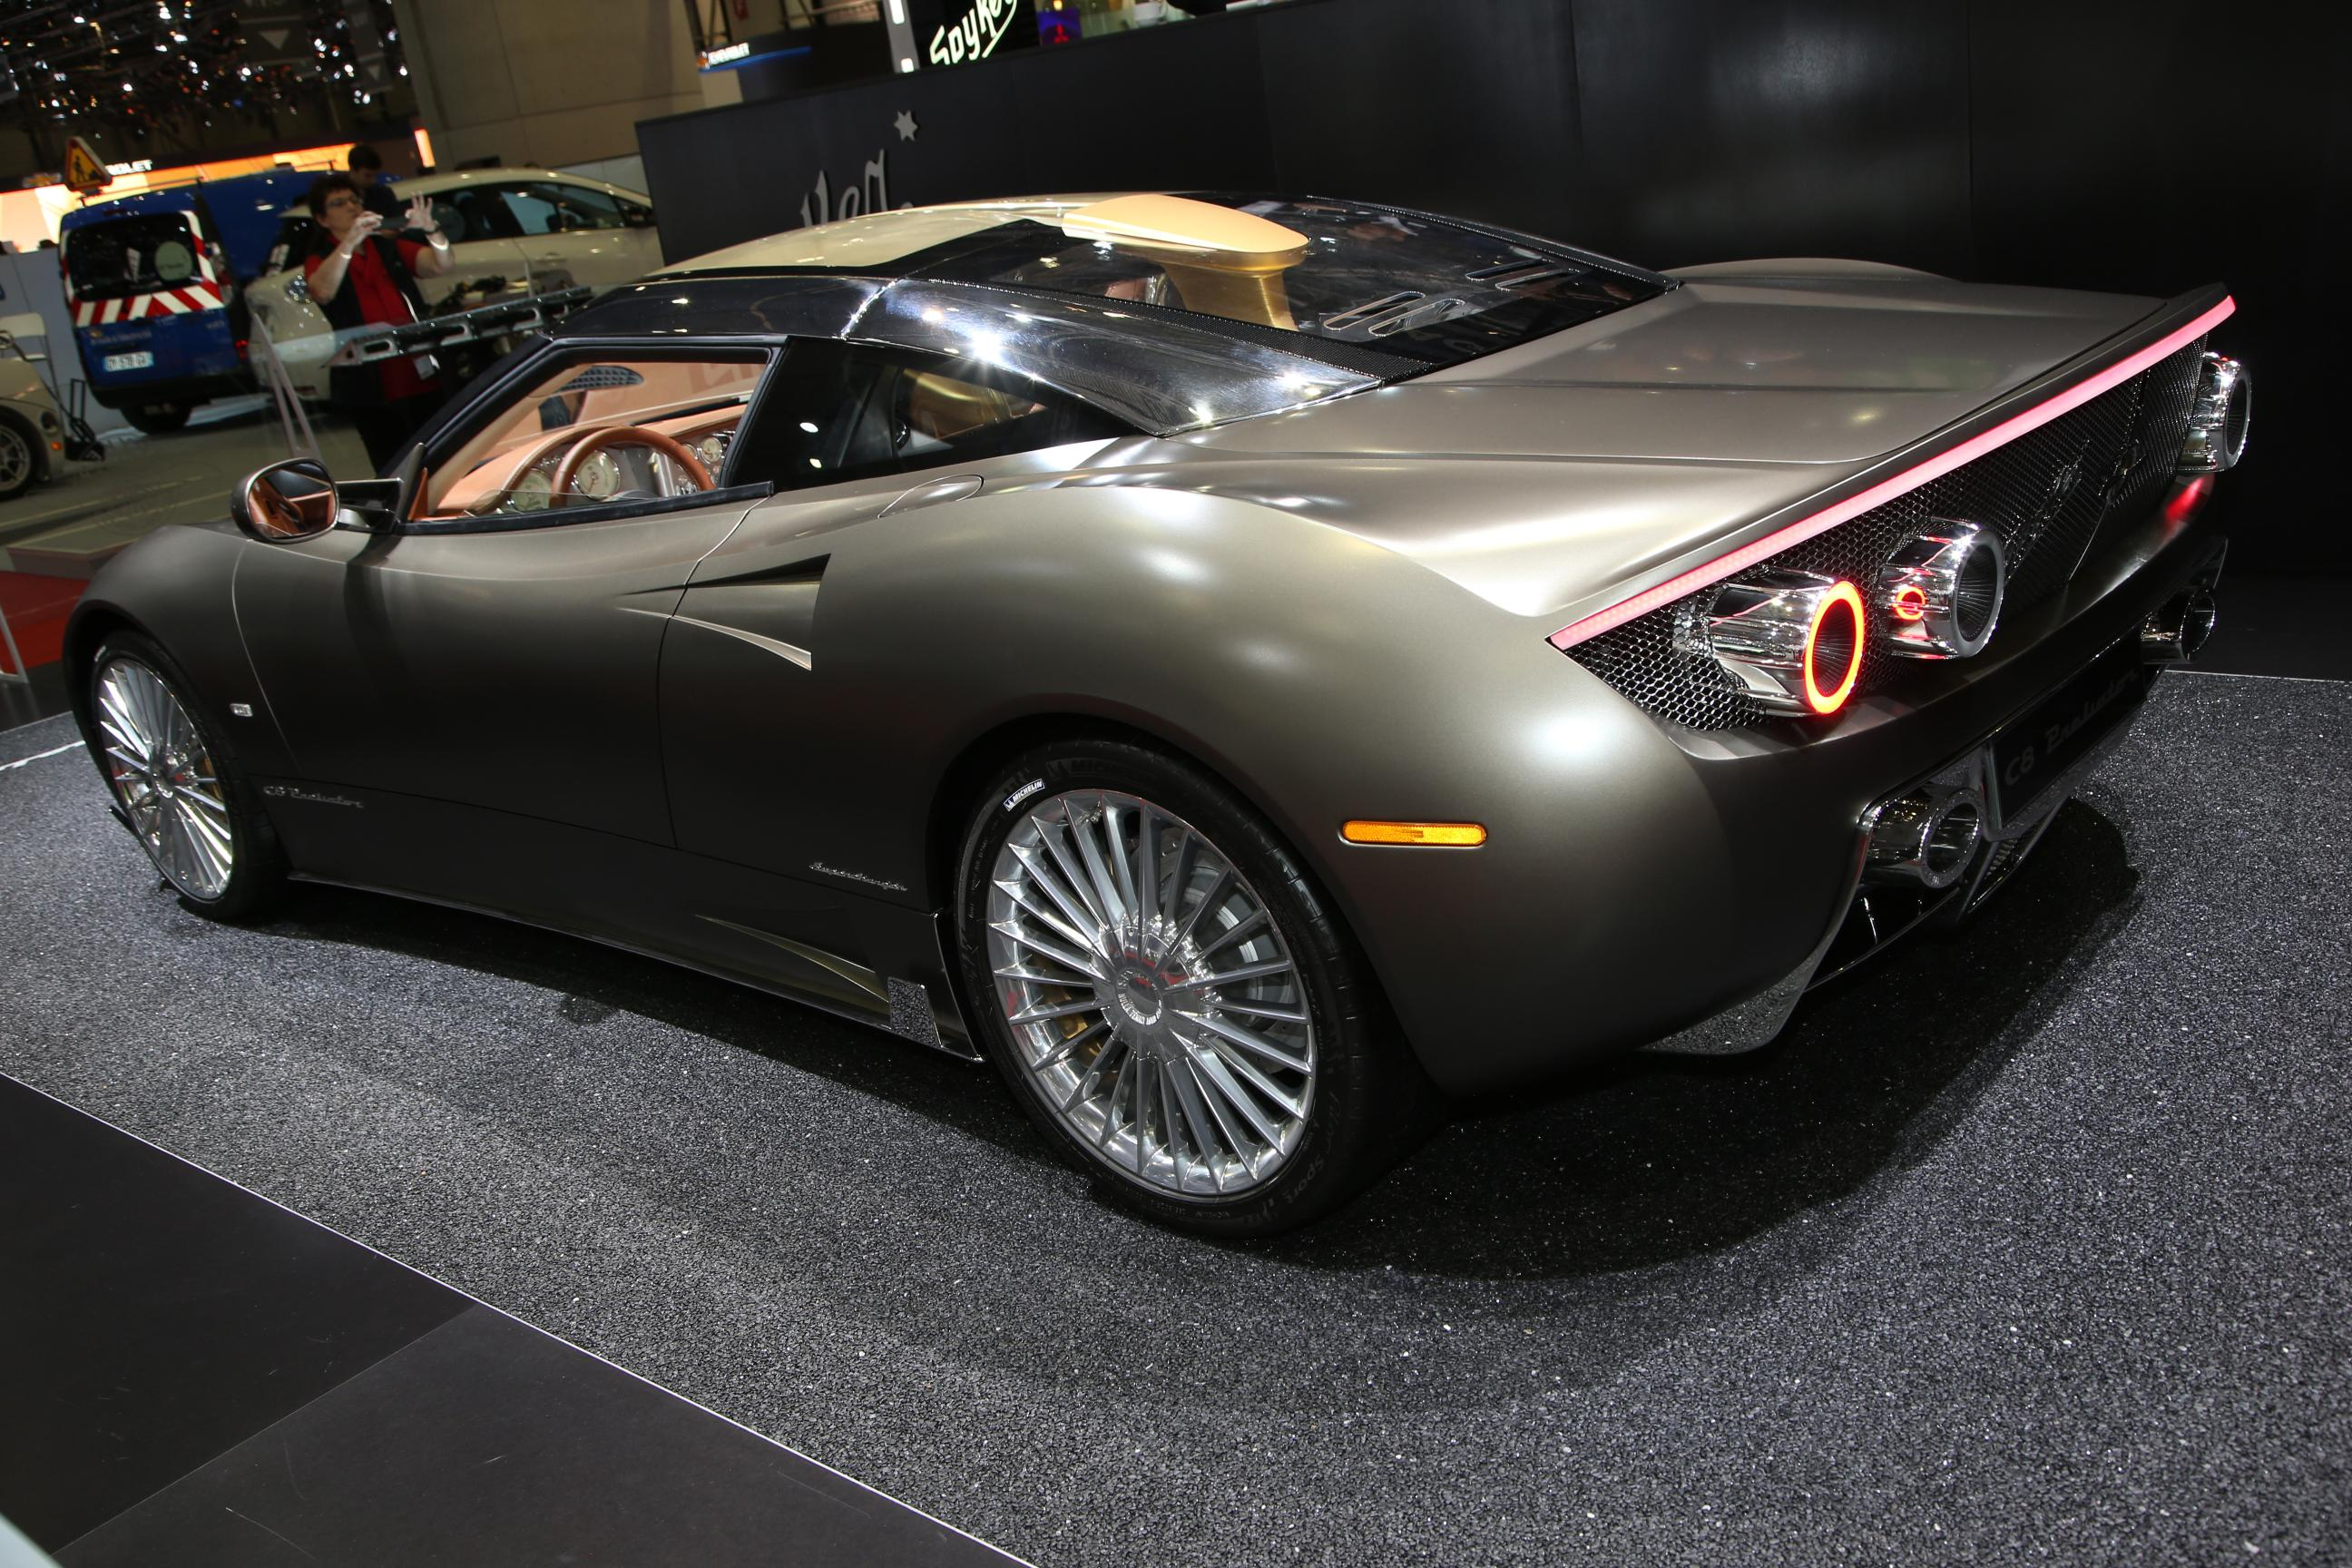 Spyker C8 Preliator, deportivo holandés hecho a mano